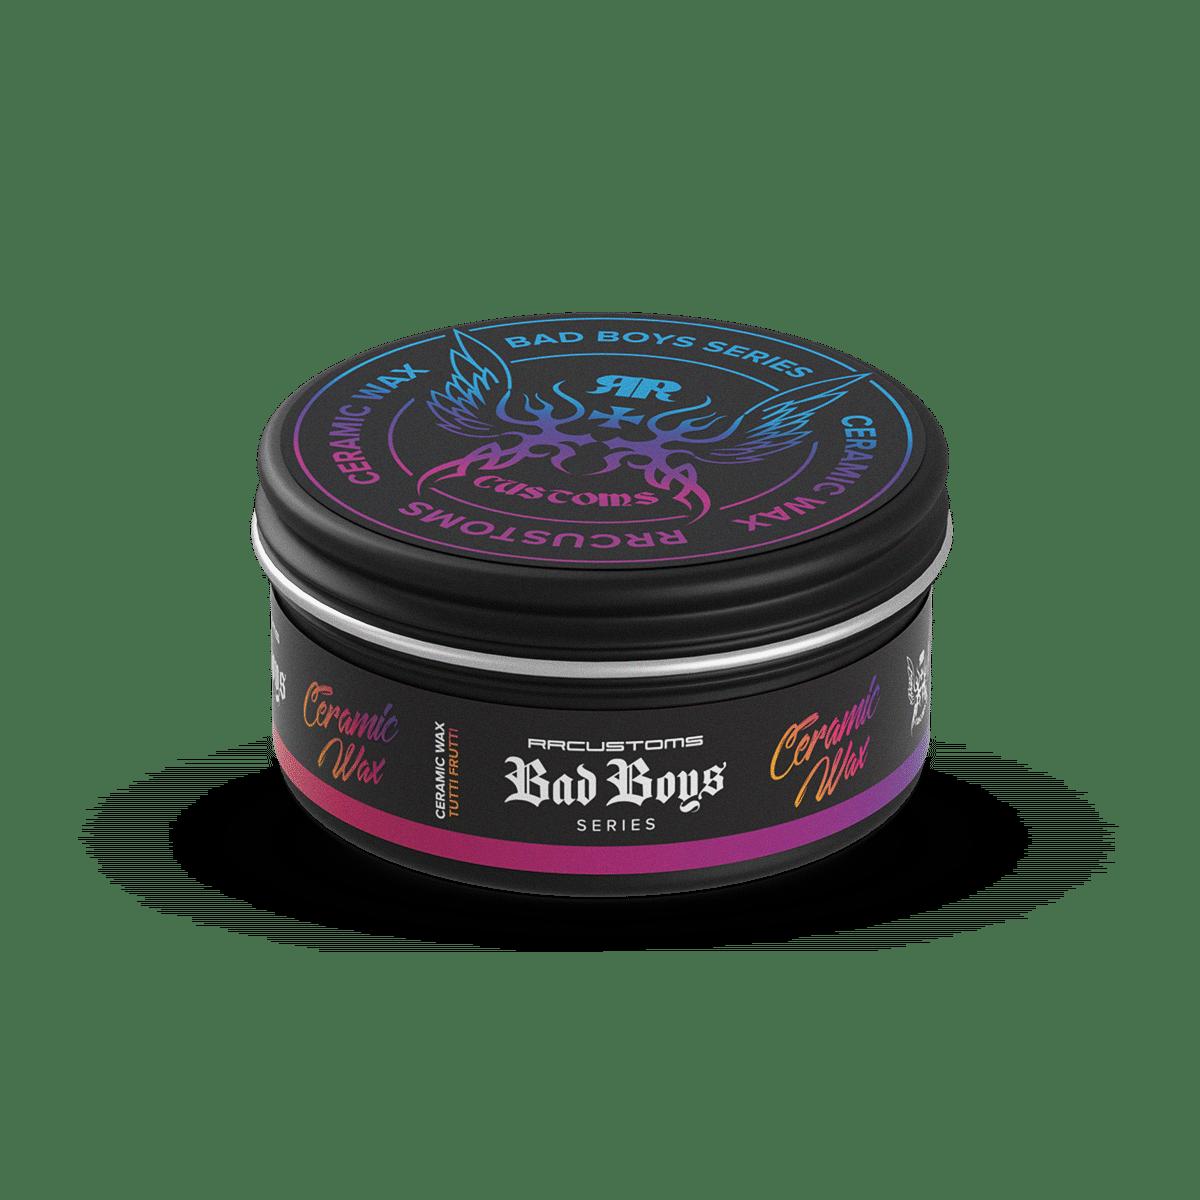 Bad Boys Ceramic Wax Tutti Frutti 100g